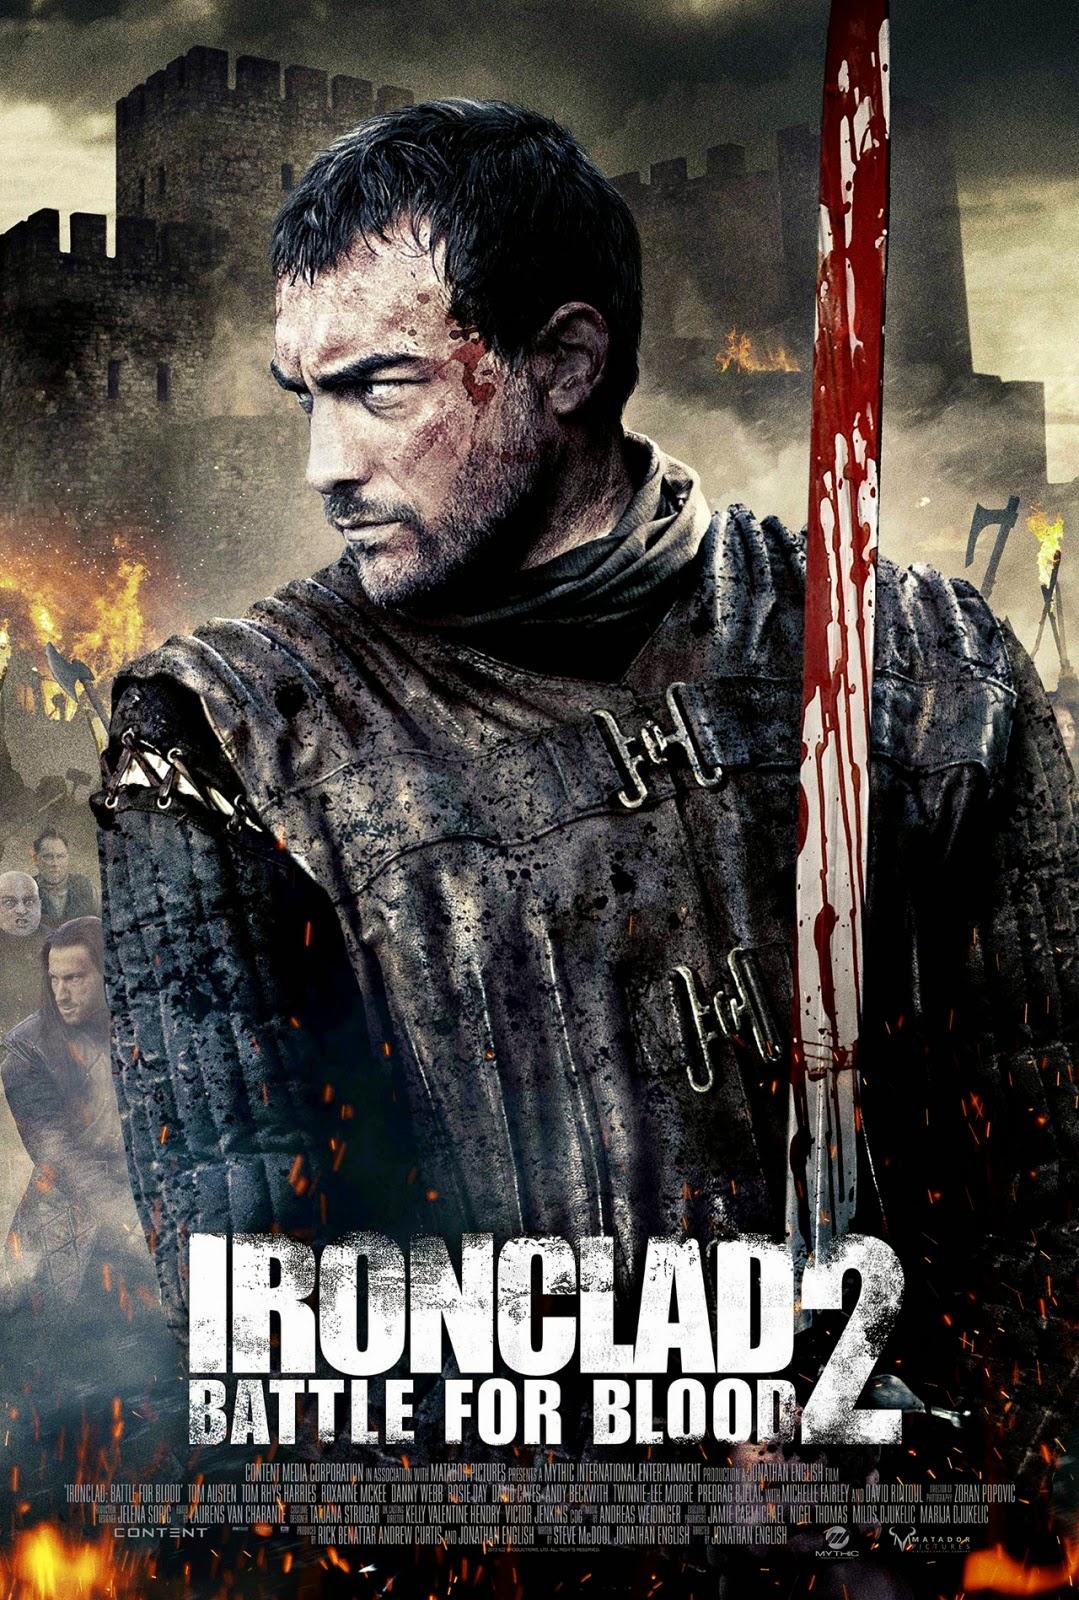 Ironclad 2 : Battle For Blood ทัพเหล็กโค่นอำนาจ 2 [HD][พากย์ไทย]